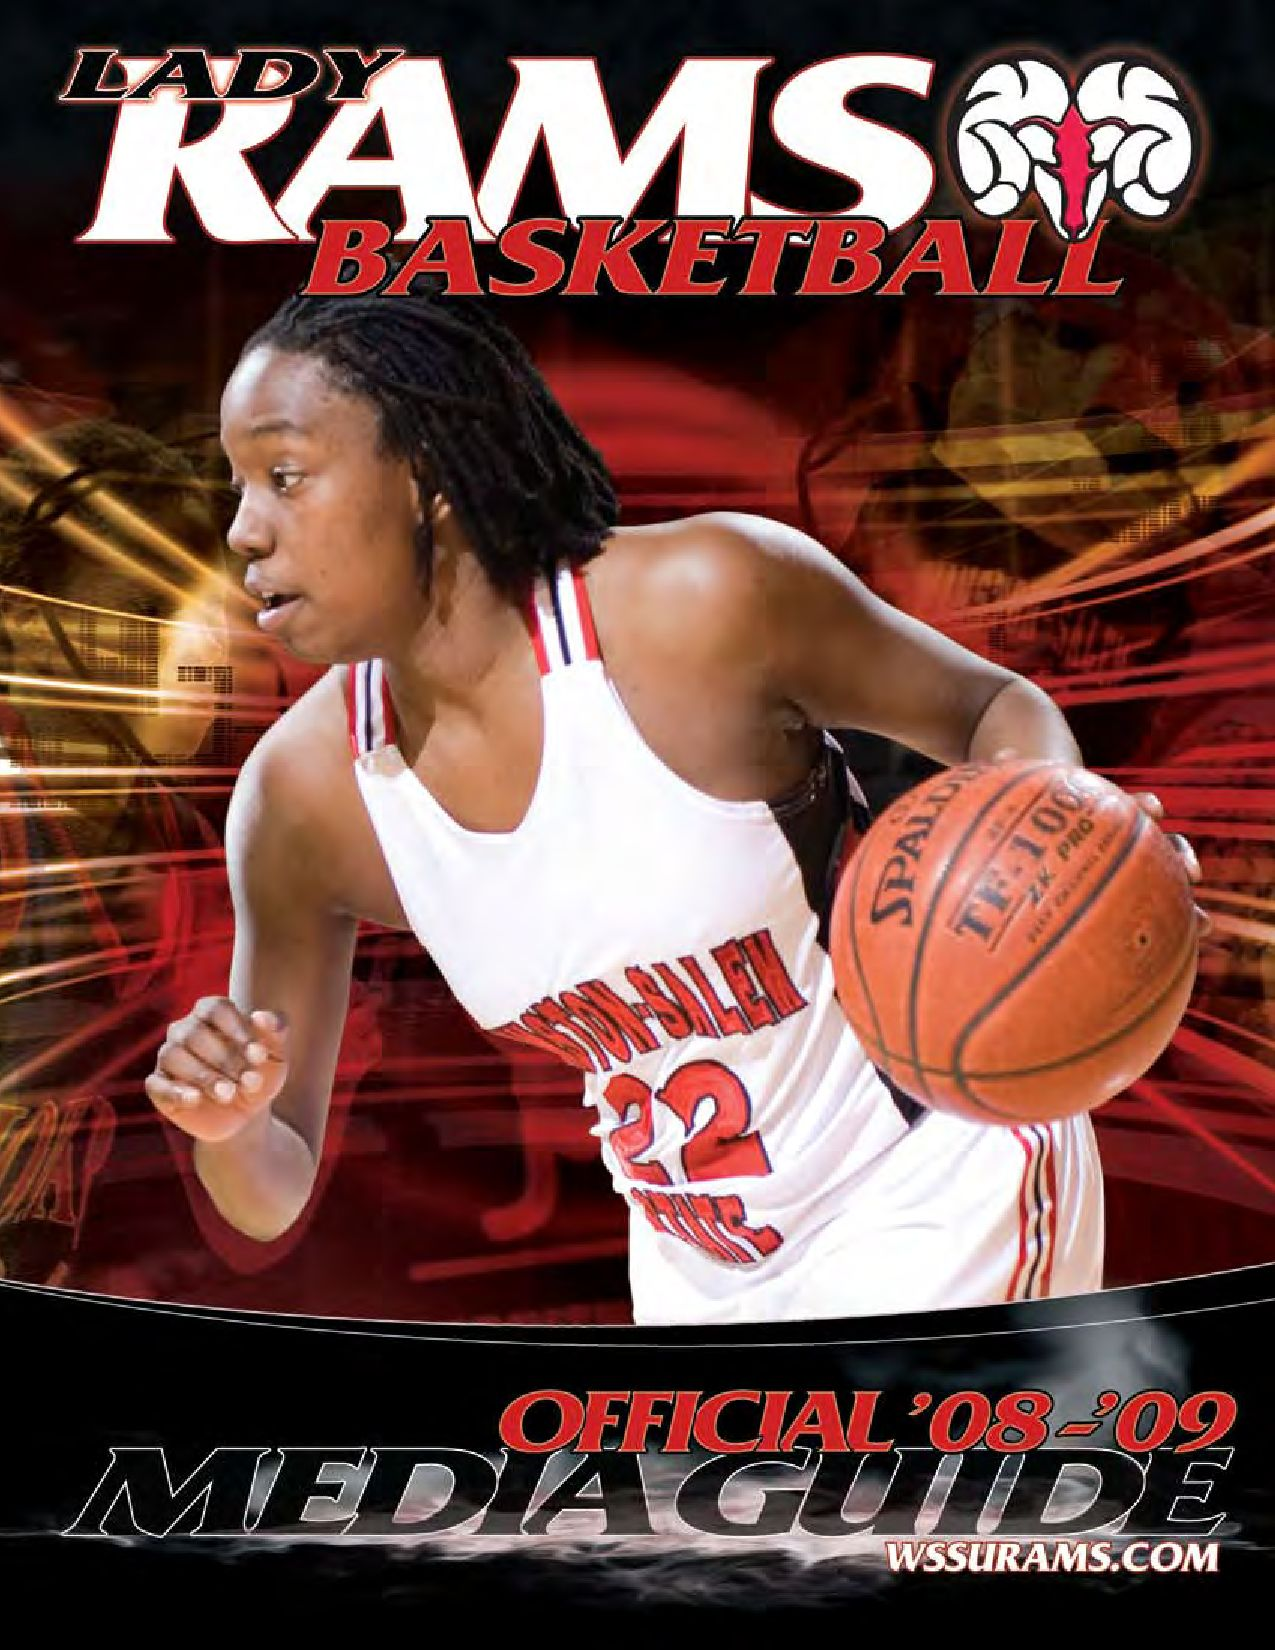 ff368368da78 2008-09 WSSU Women s Basketball Media Guide by Winston-Salem State  University Athletics - issuu